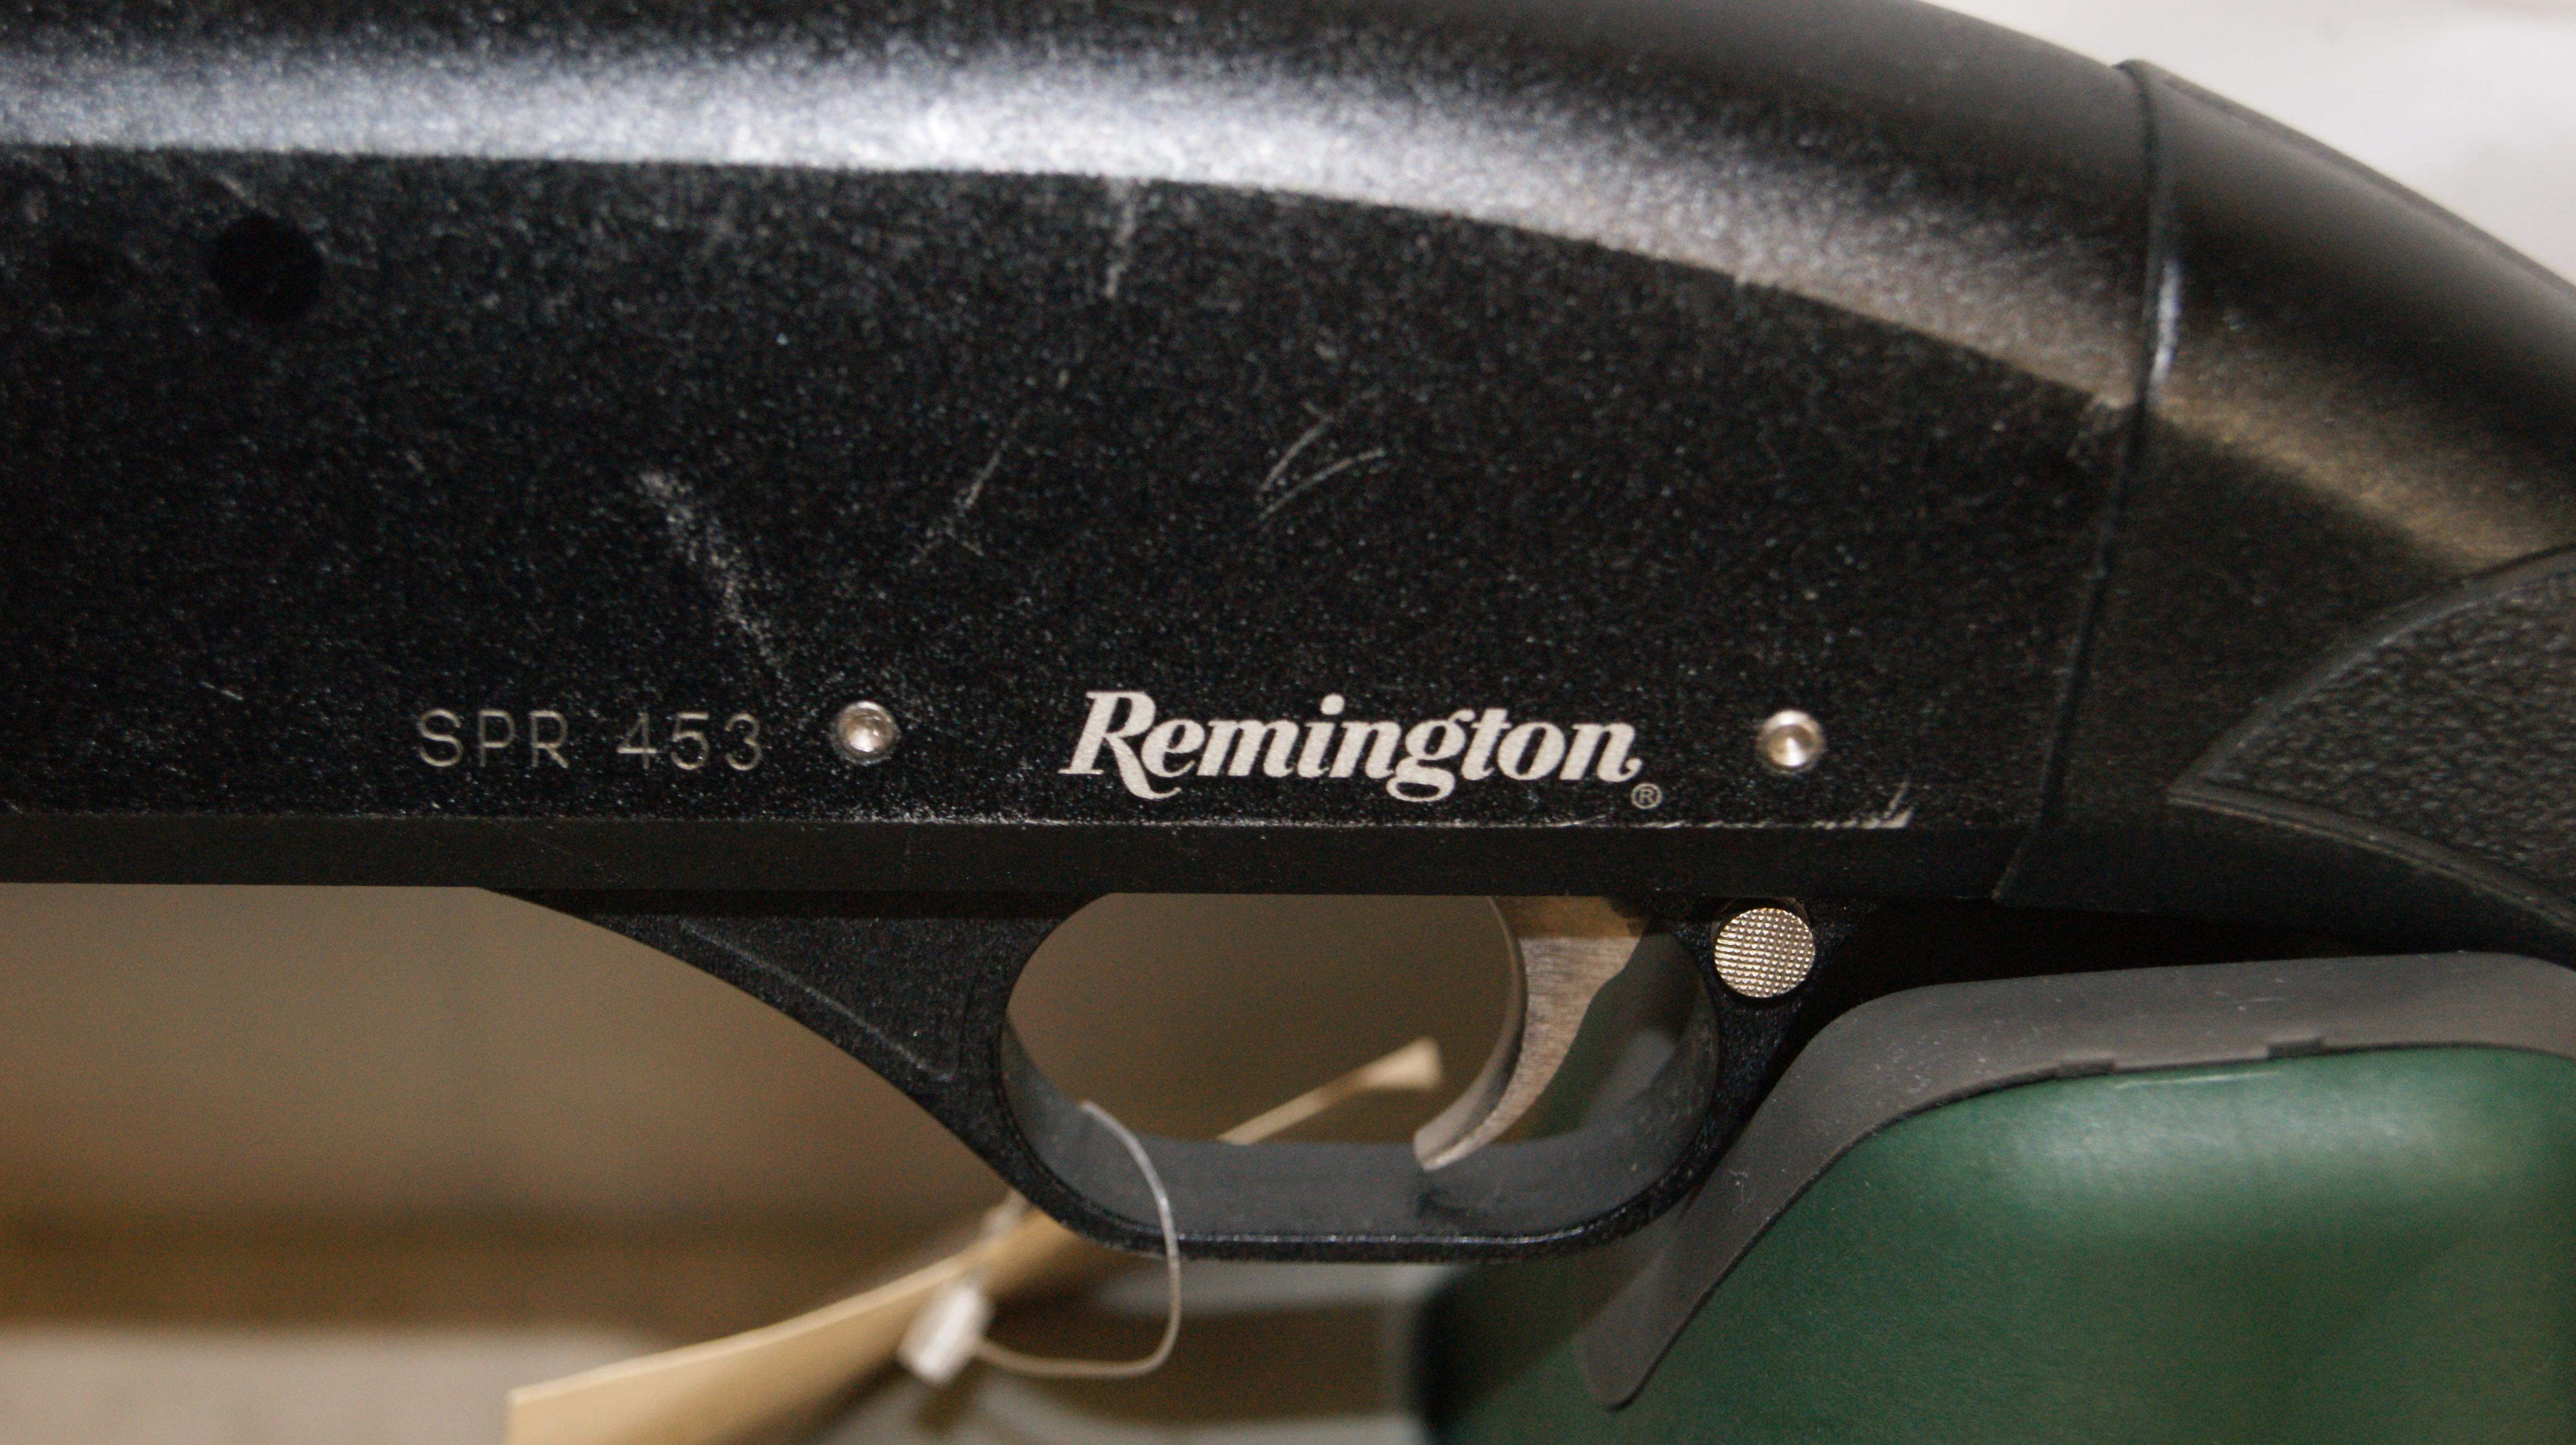 Remington Baikal SPR 453 Semi-automatic 12 gauge